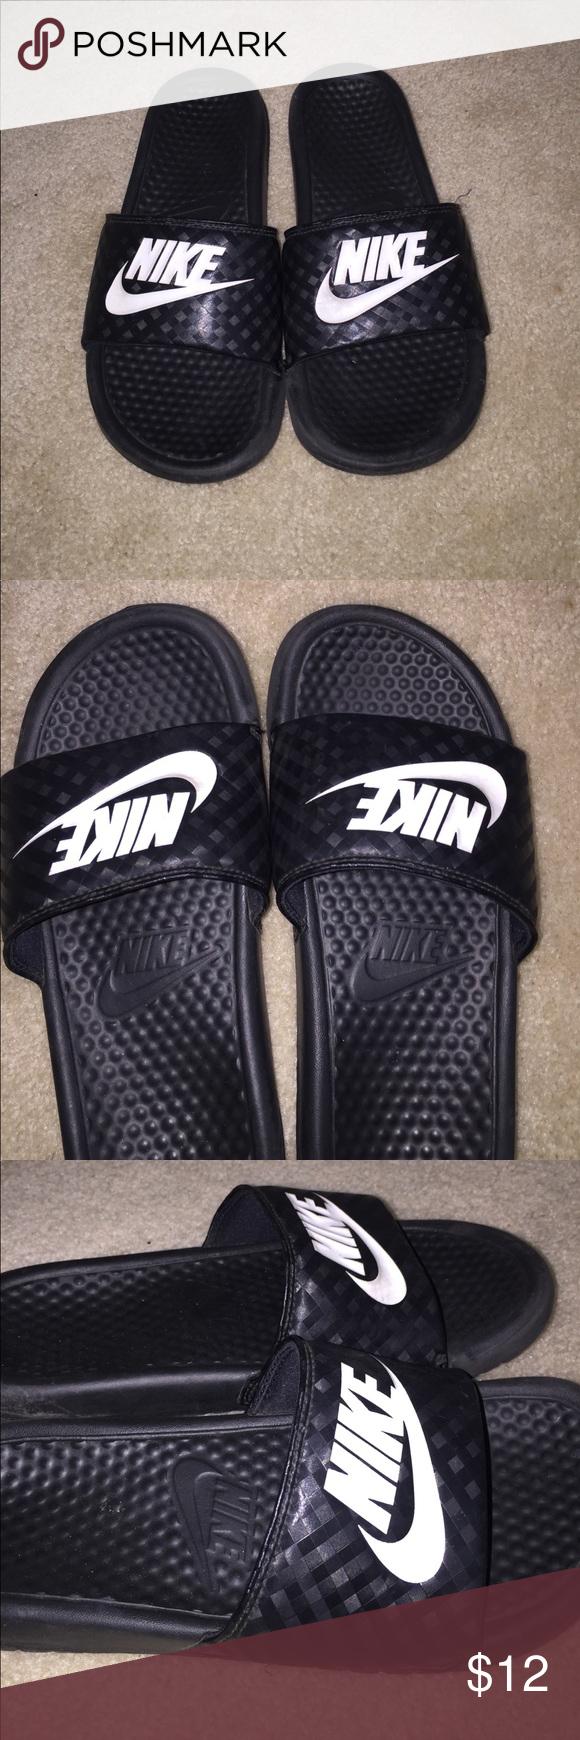 52e5de3b54de69 Nike Slides black nike sandals